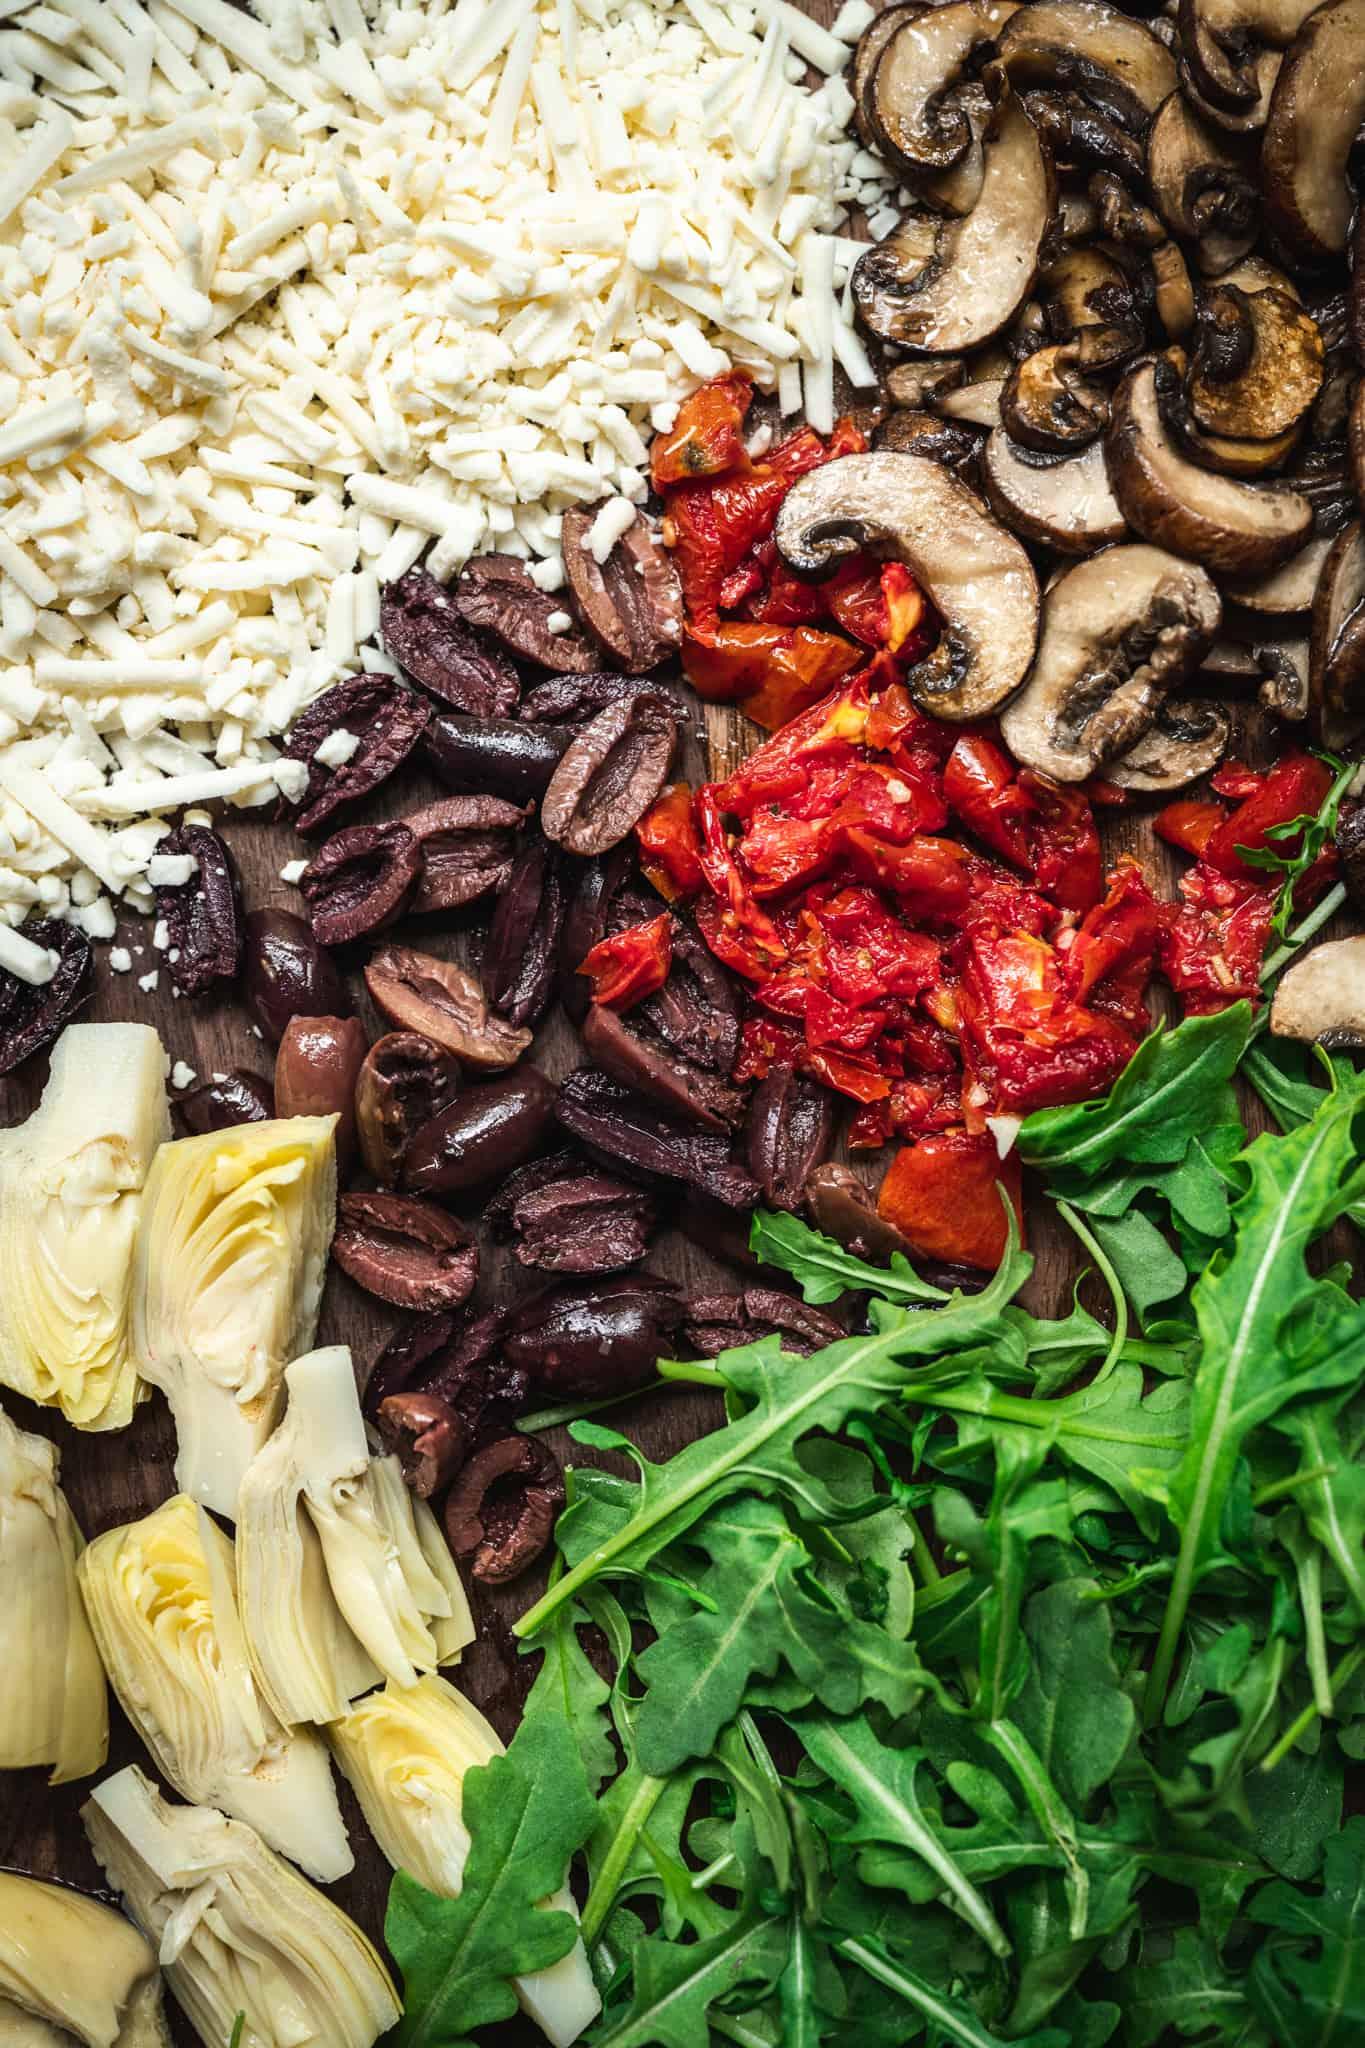 Overhead of vegan cheese, mushrooms, olives, sun-dried tomatoes, artichokes and arugula